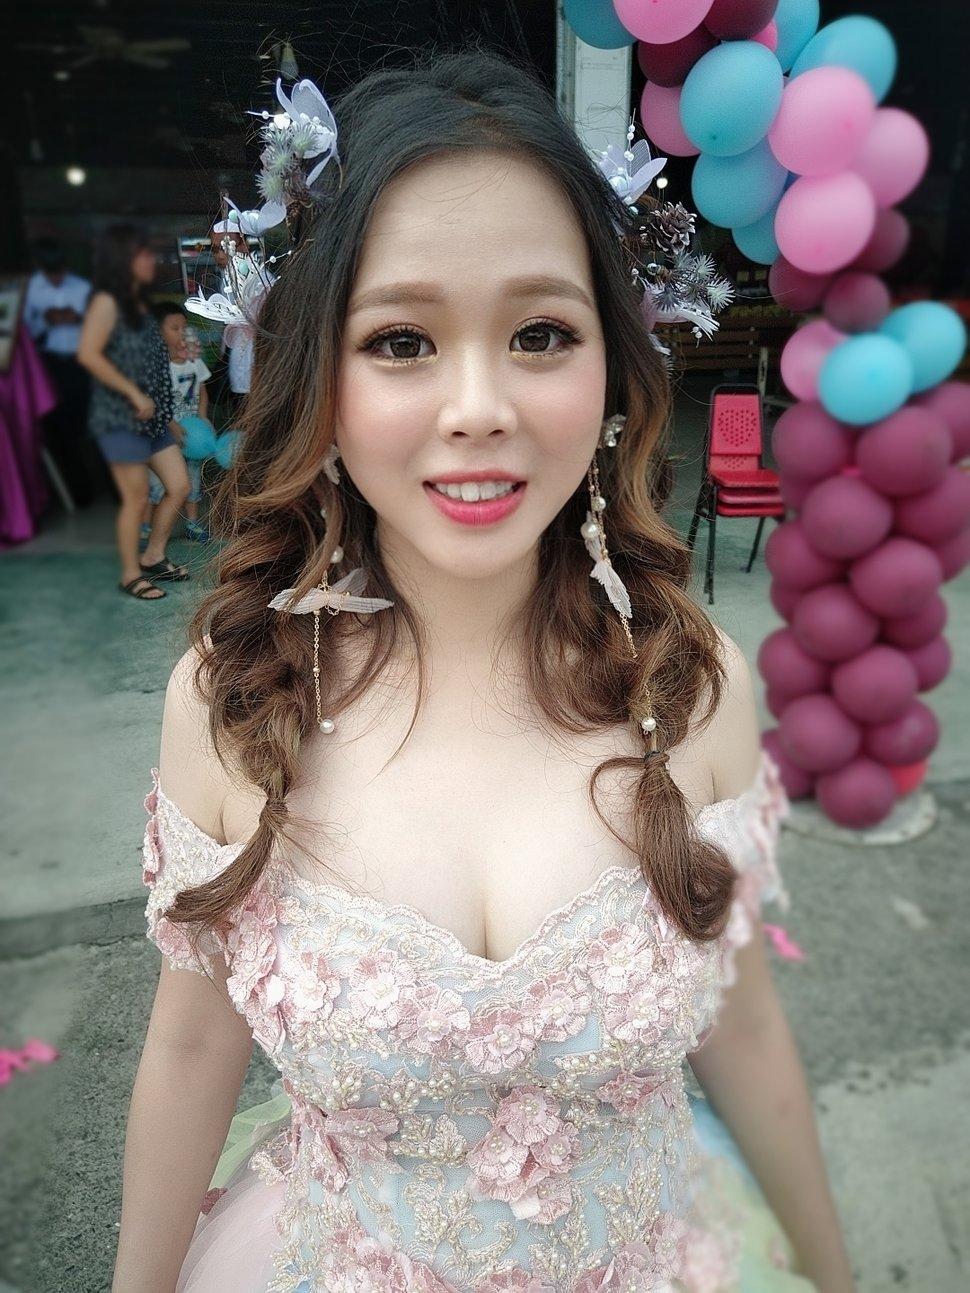 MYXJ_20190728194140_save_mr1565798867996 - Elaine makeup《結婚吧》